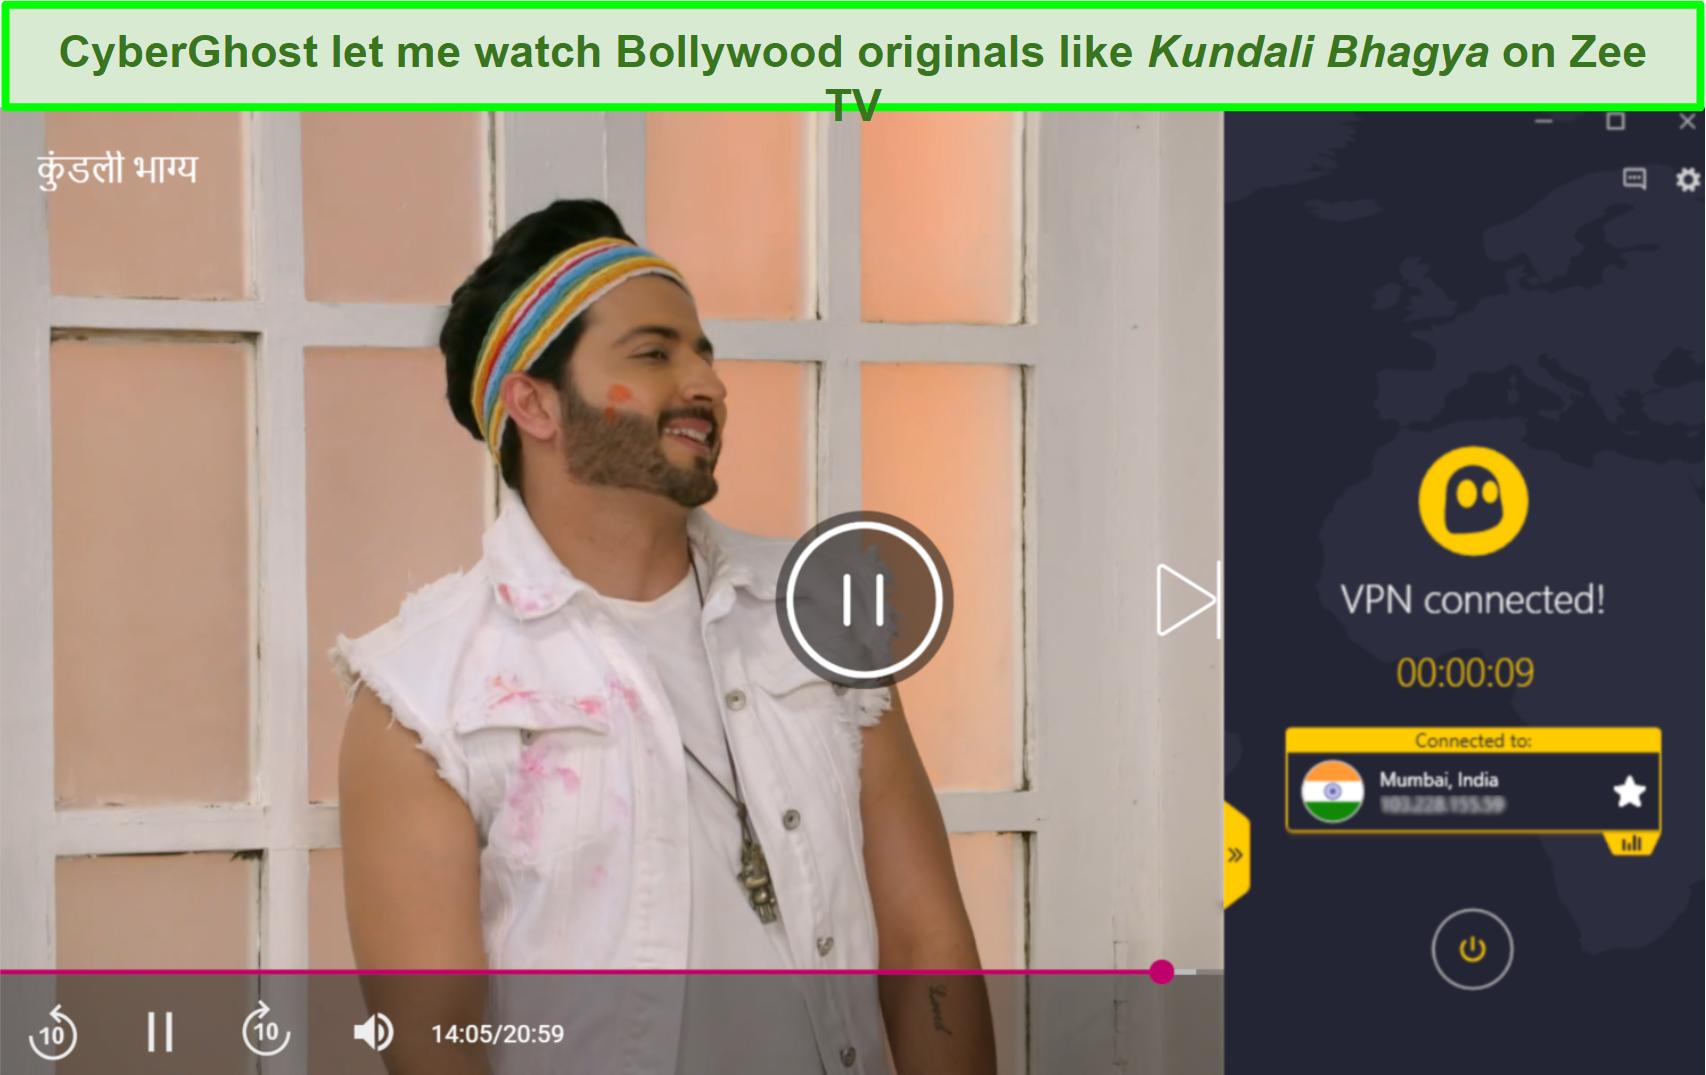 Screenshot of Kundali Bhagya on Zee TV playing with Cyberghost connected